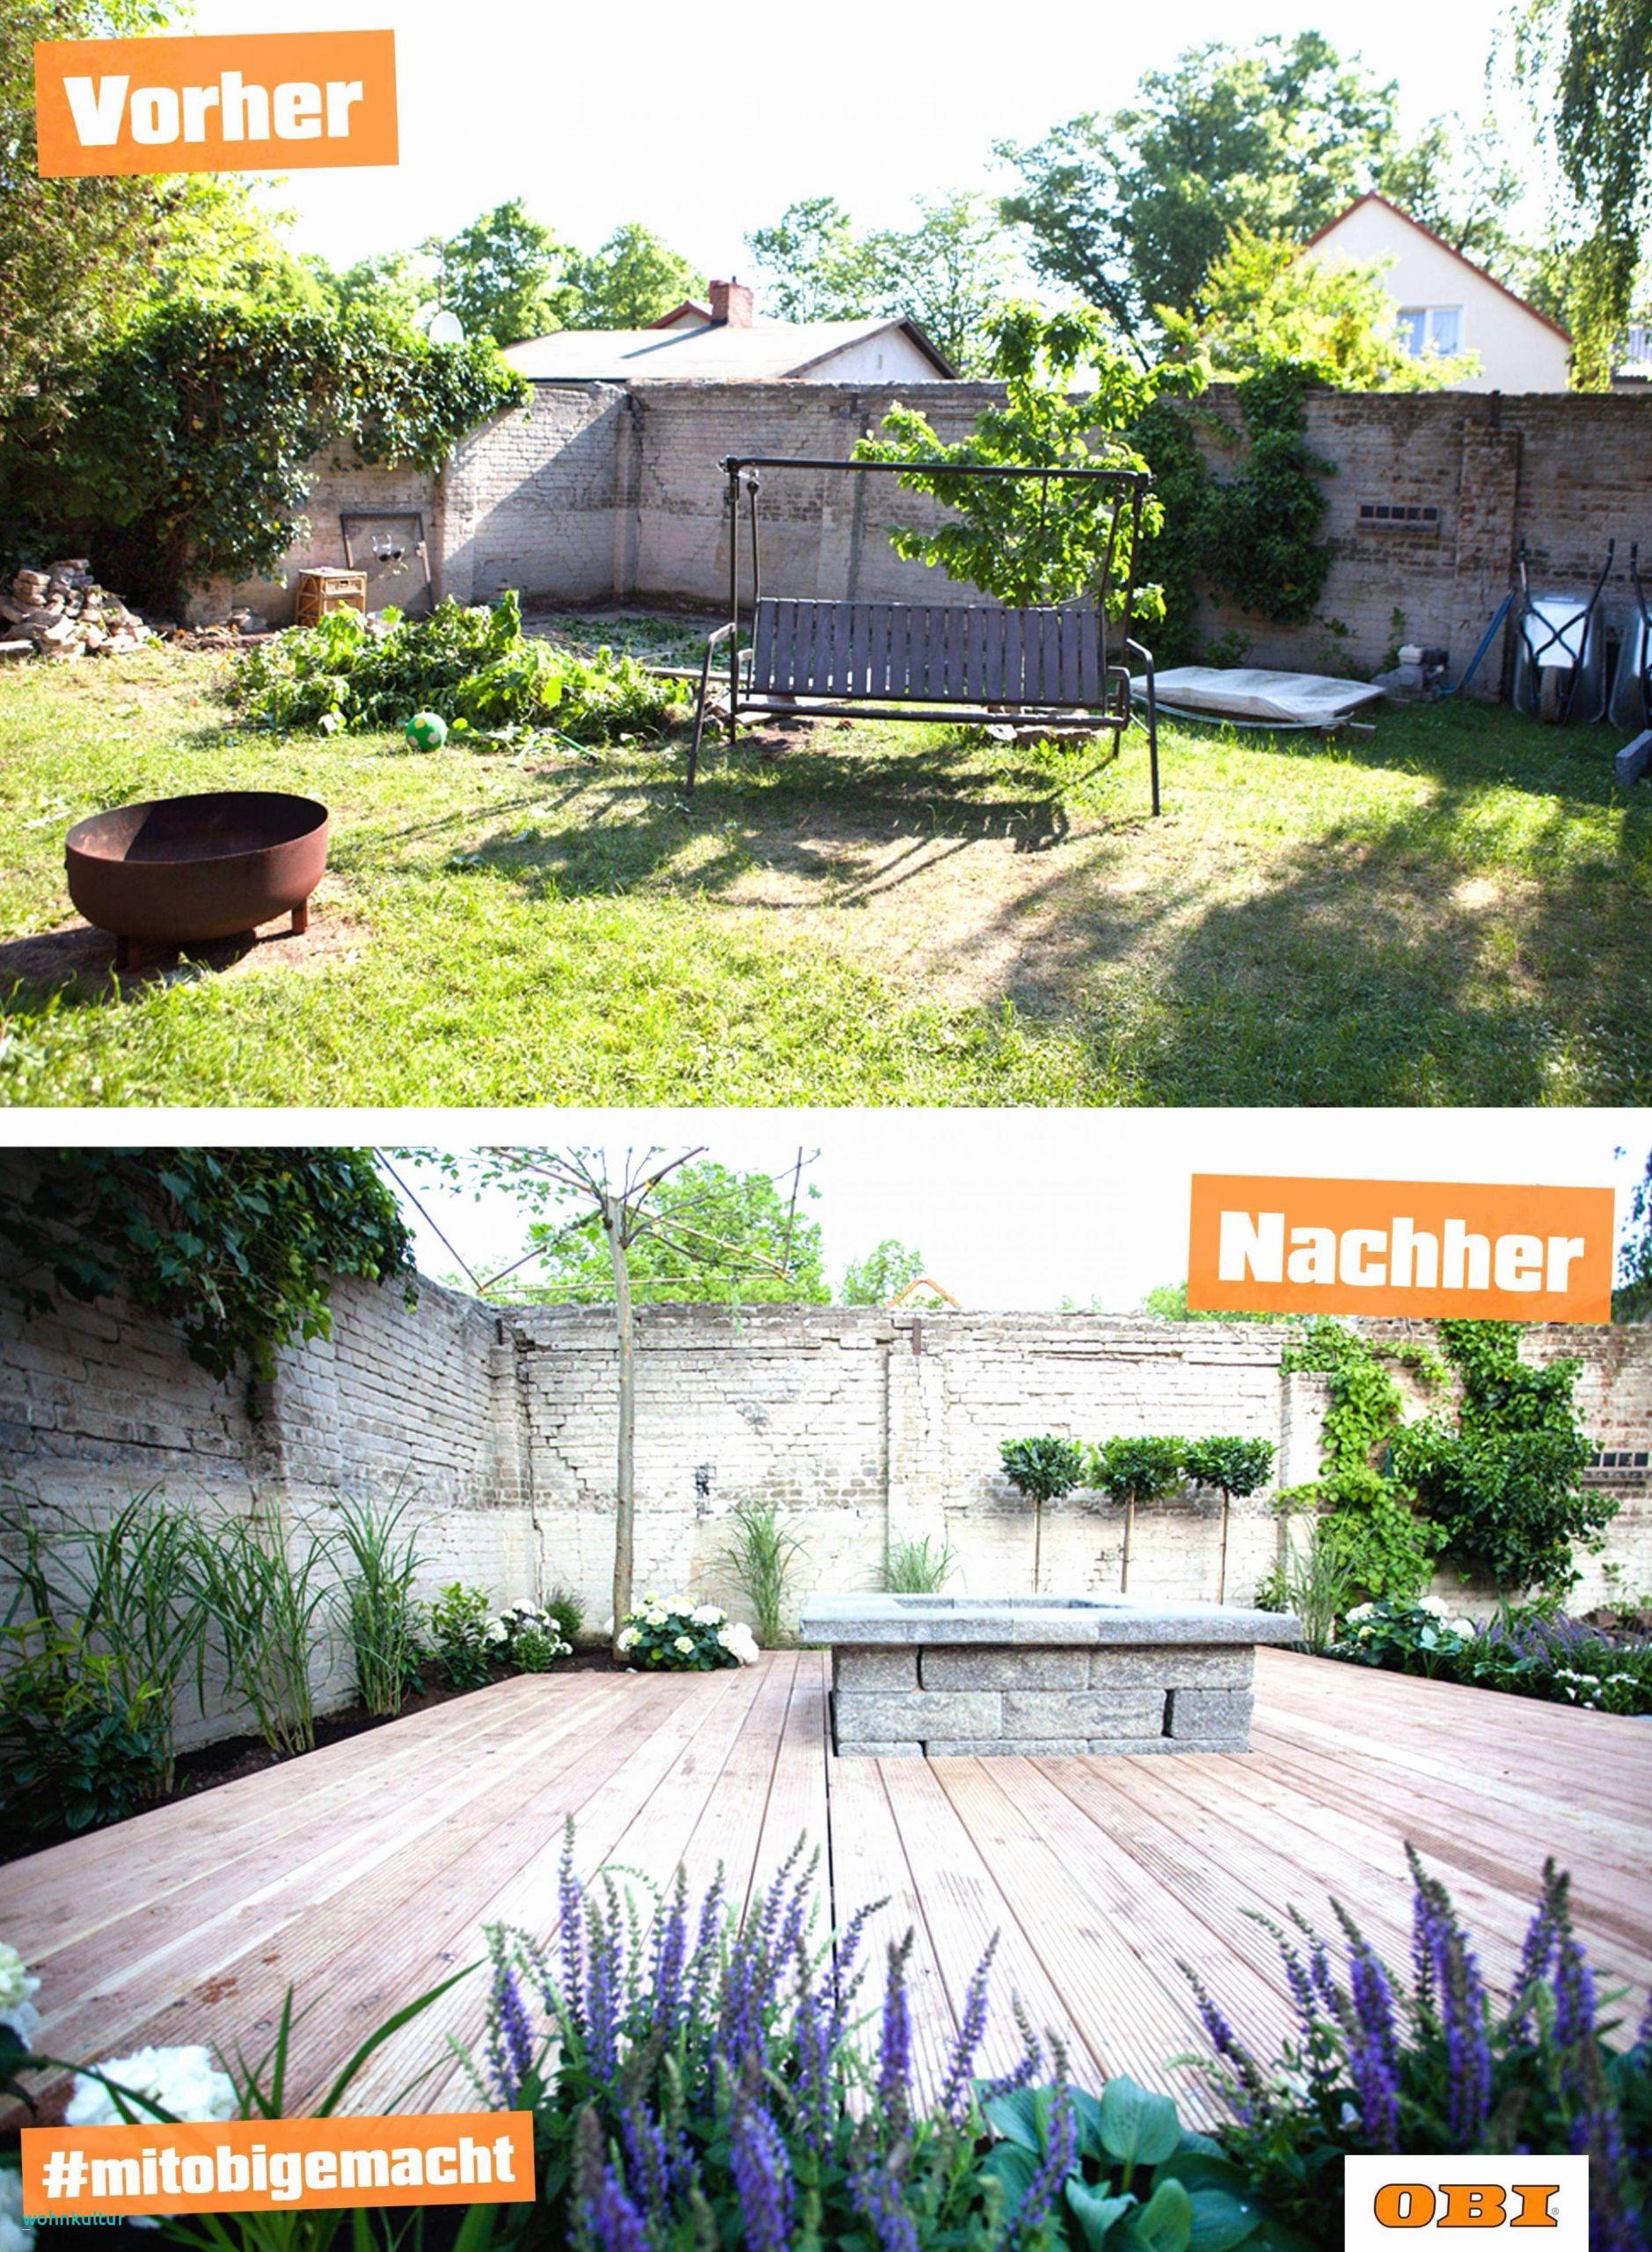 garten anlegen kosten schon kleiner reihenhausgarten gestalten temobardz home blog of garten anlegen kosten 1 scaled